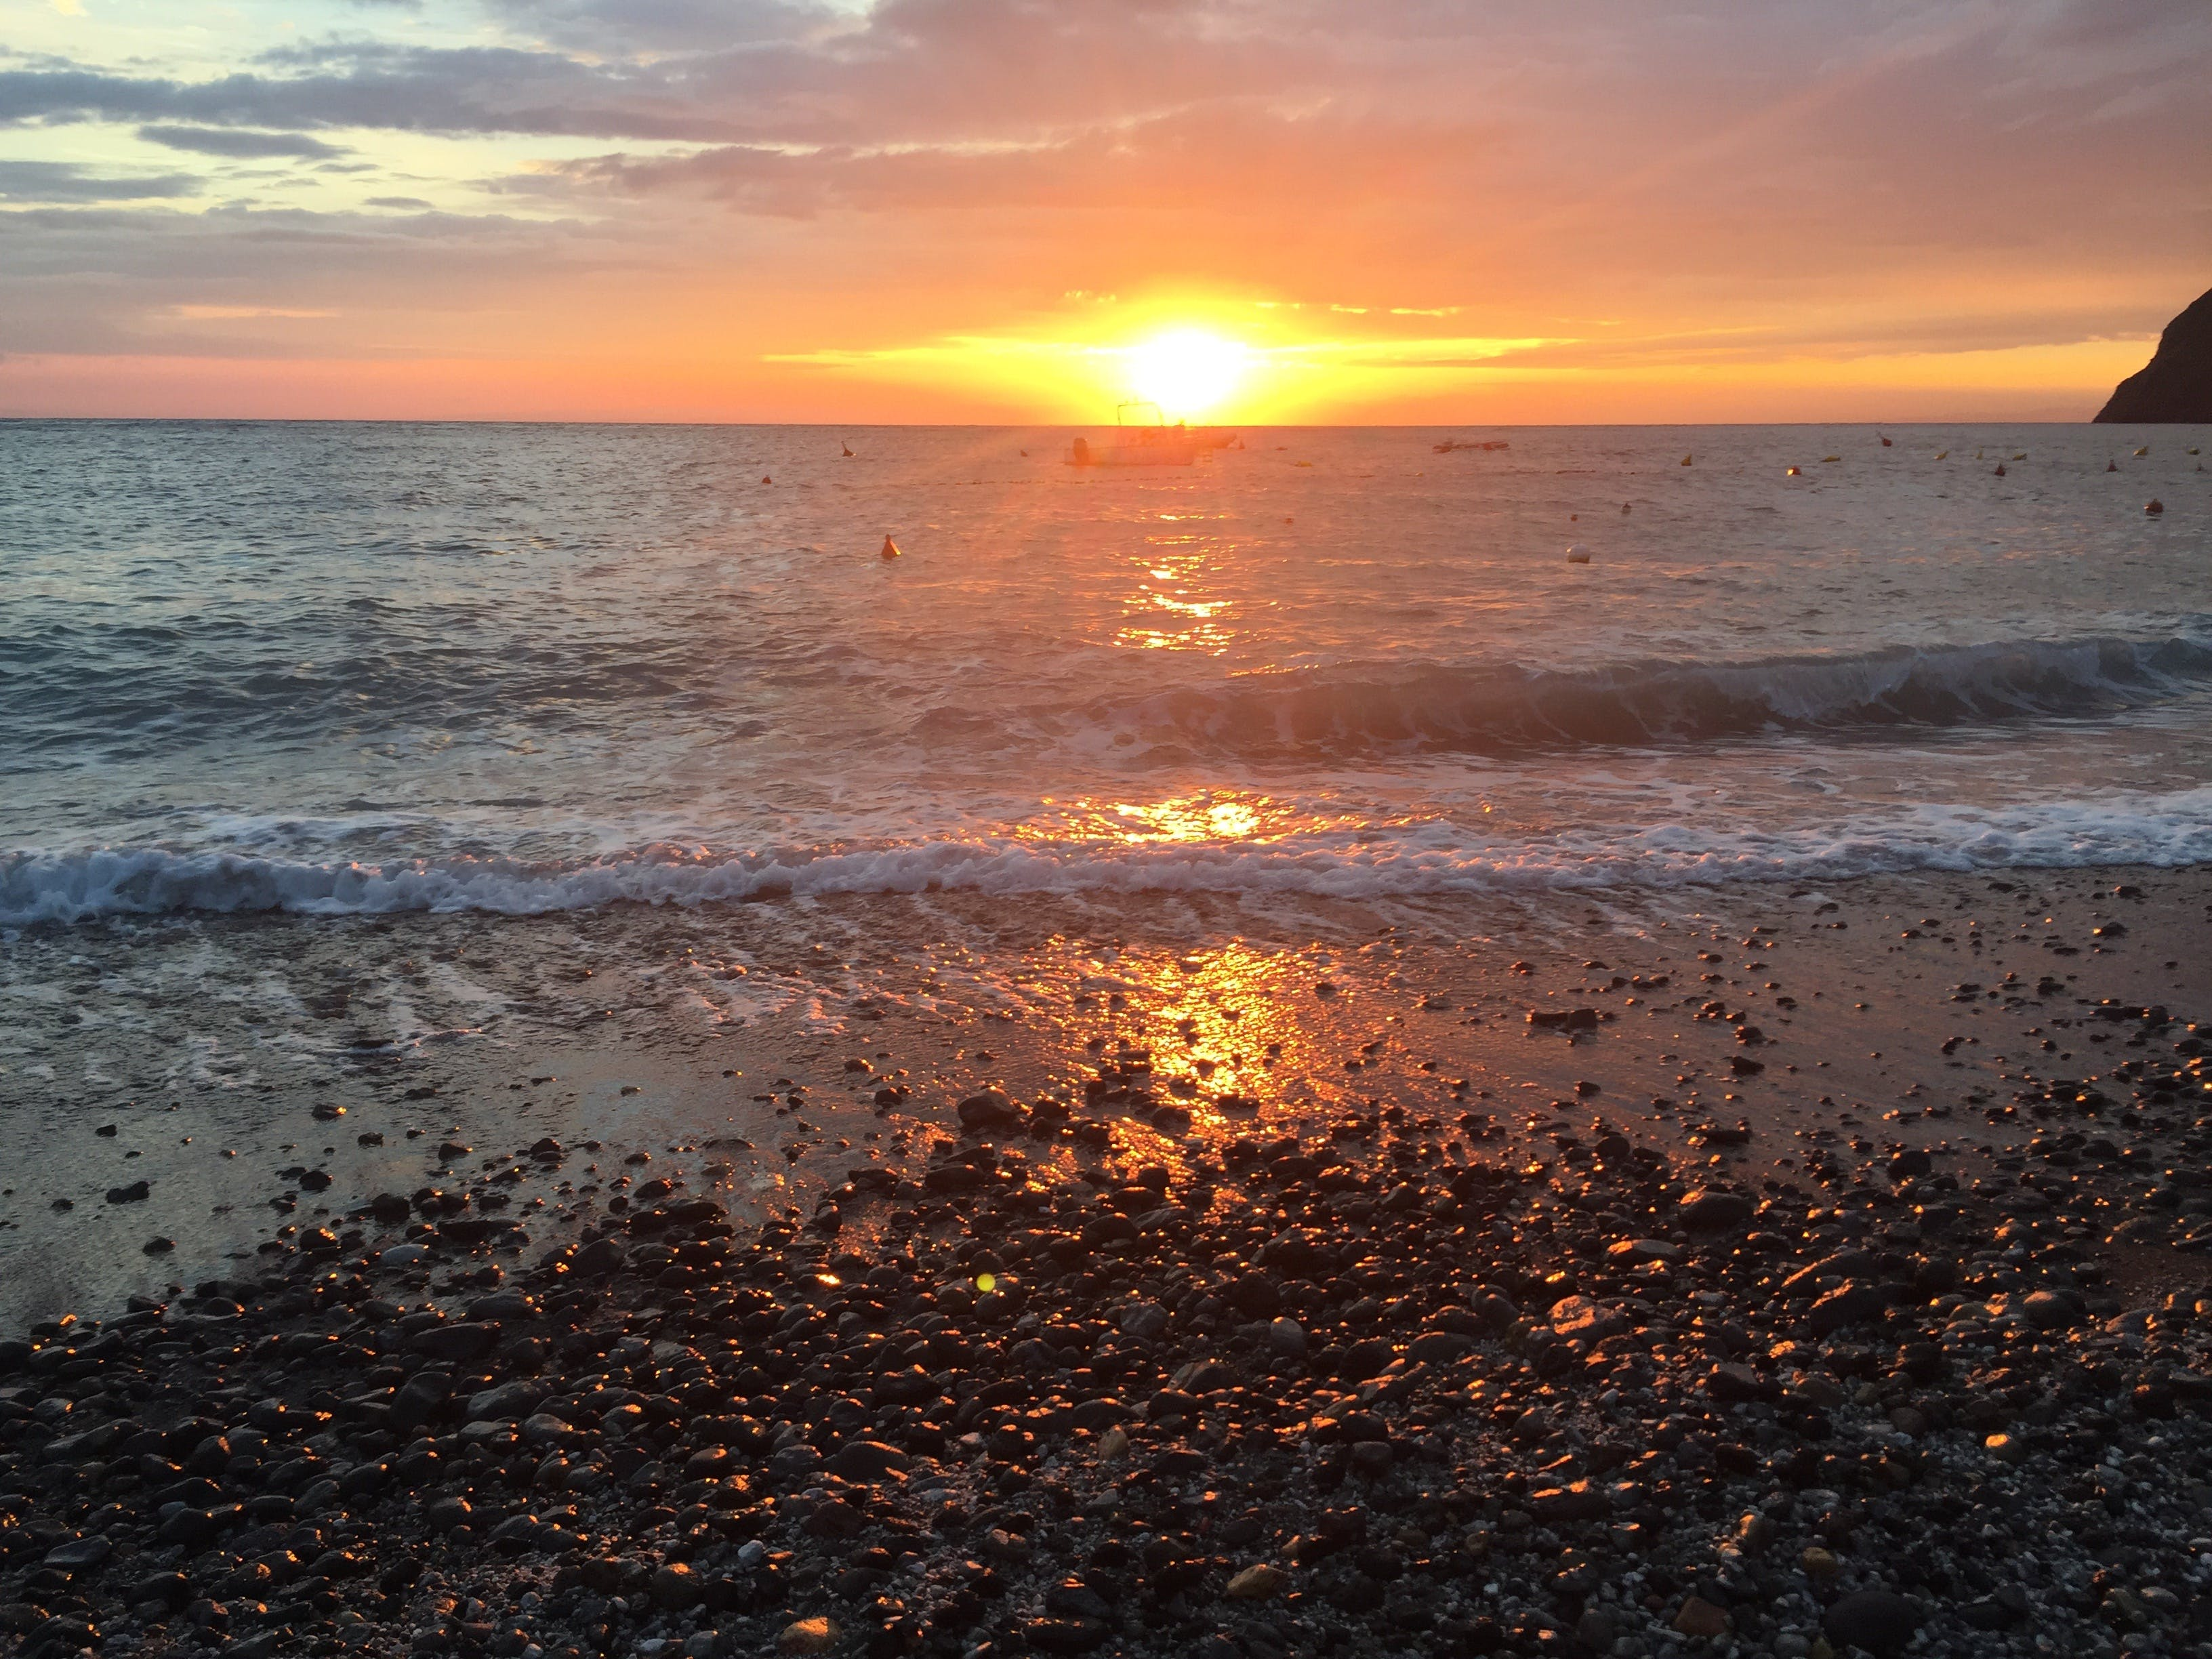 Free stock photo of beach clouds  dawn  dusk  horizon  landscape, italy, lipari, seawater